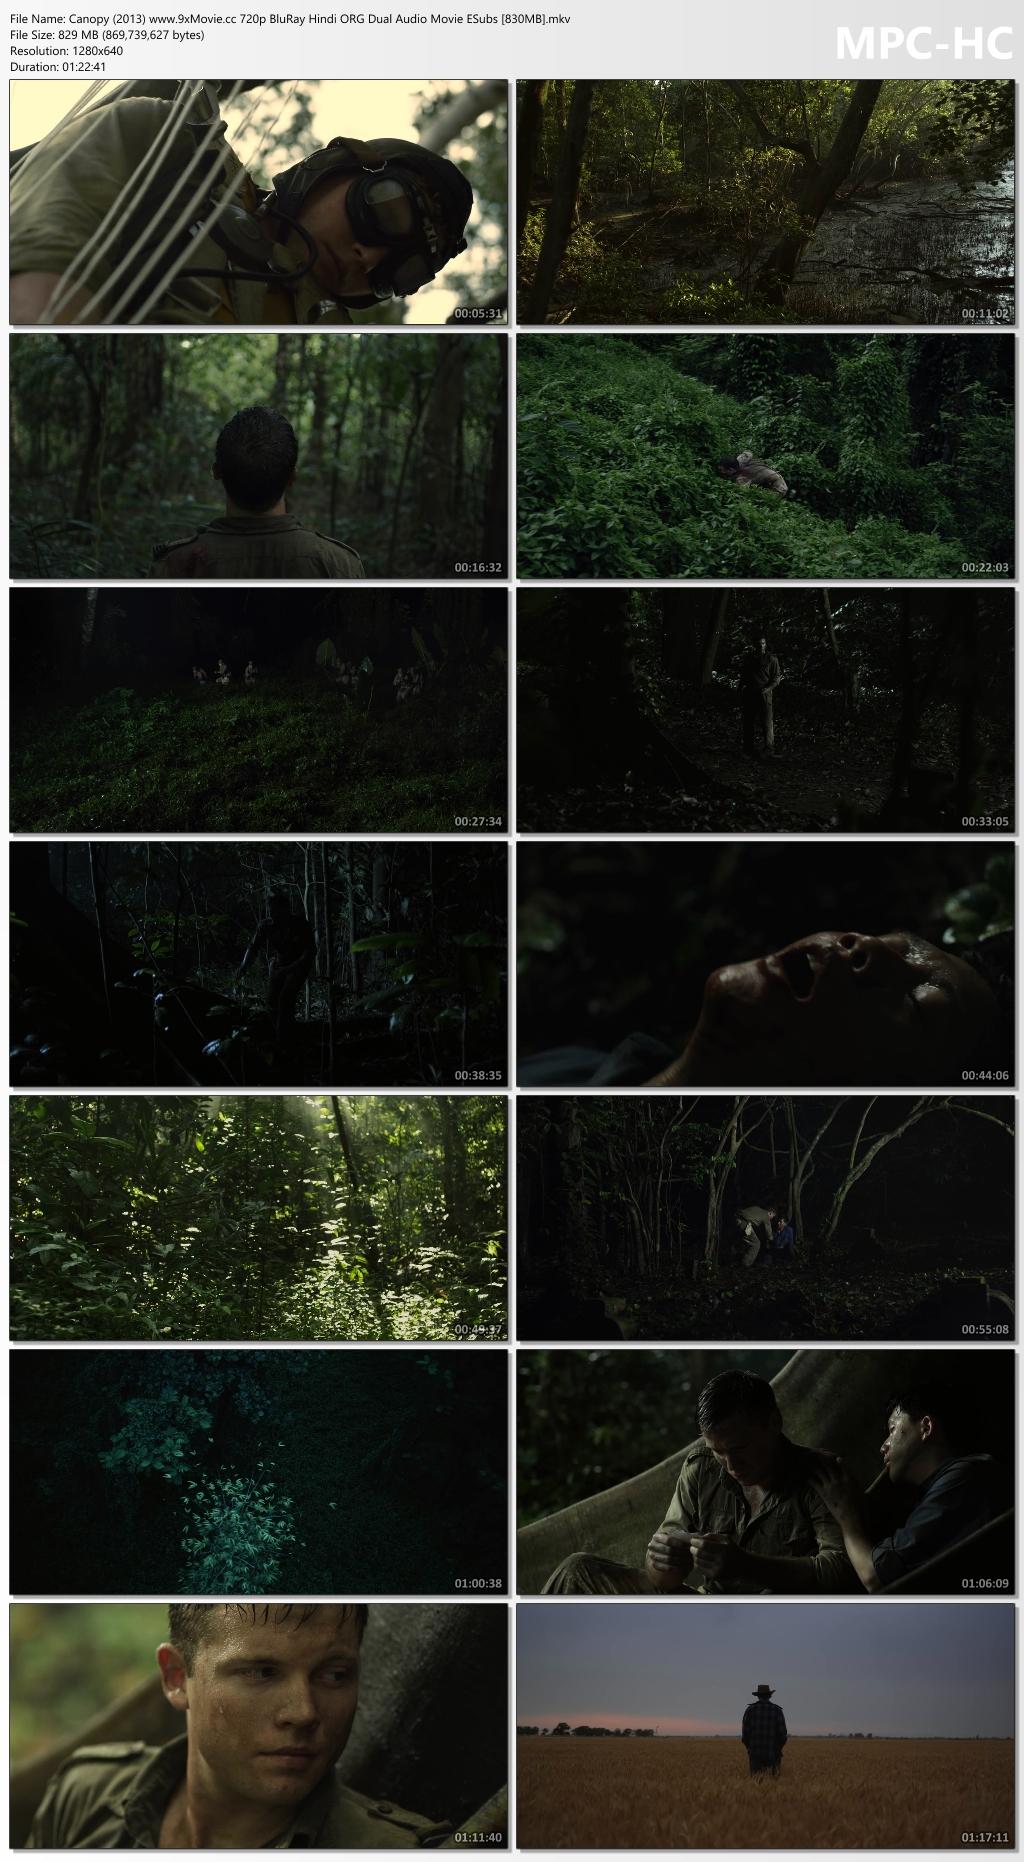 Canopy-2013-www-9x-Movie-cc-720p-Blu-Ray-Hindi-ORG-Dual-Audio-Movie-ESubs-830-MB-mkv